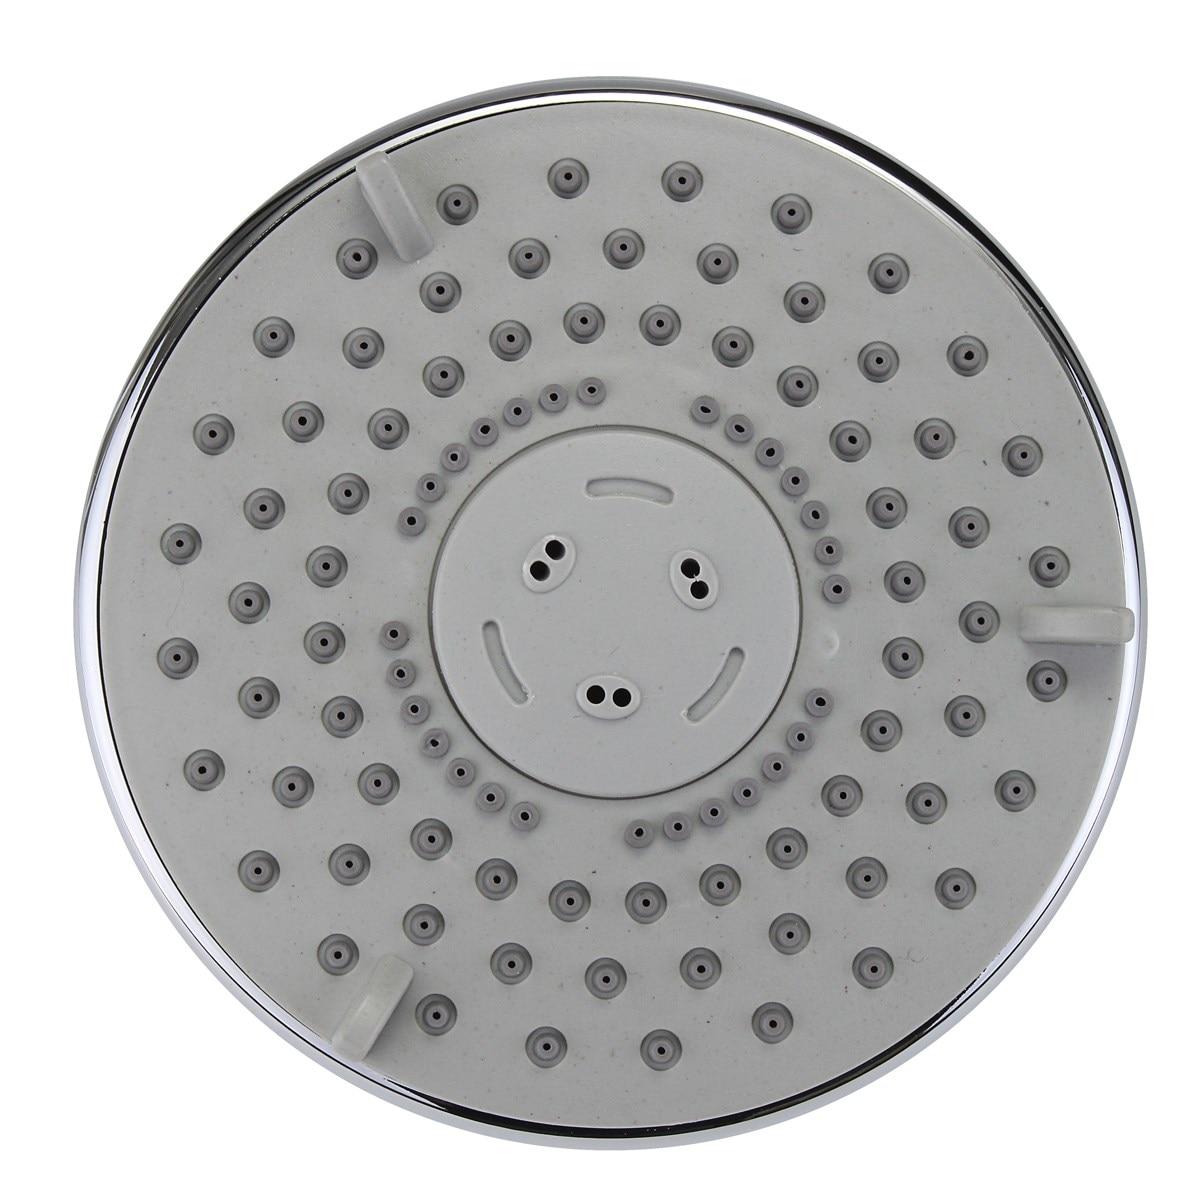 5inch Fixed Shower Head ABS High Press Rainfall Shower Heads Over ...